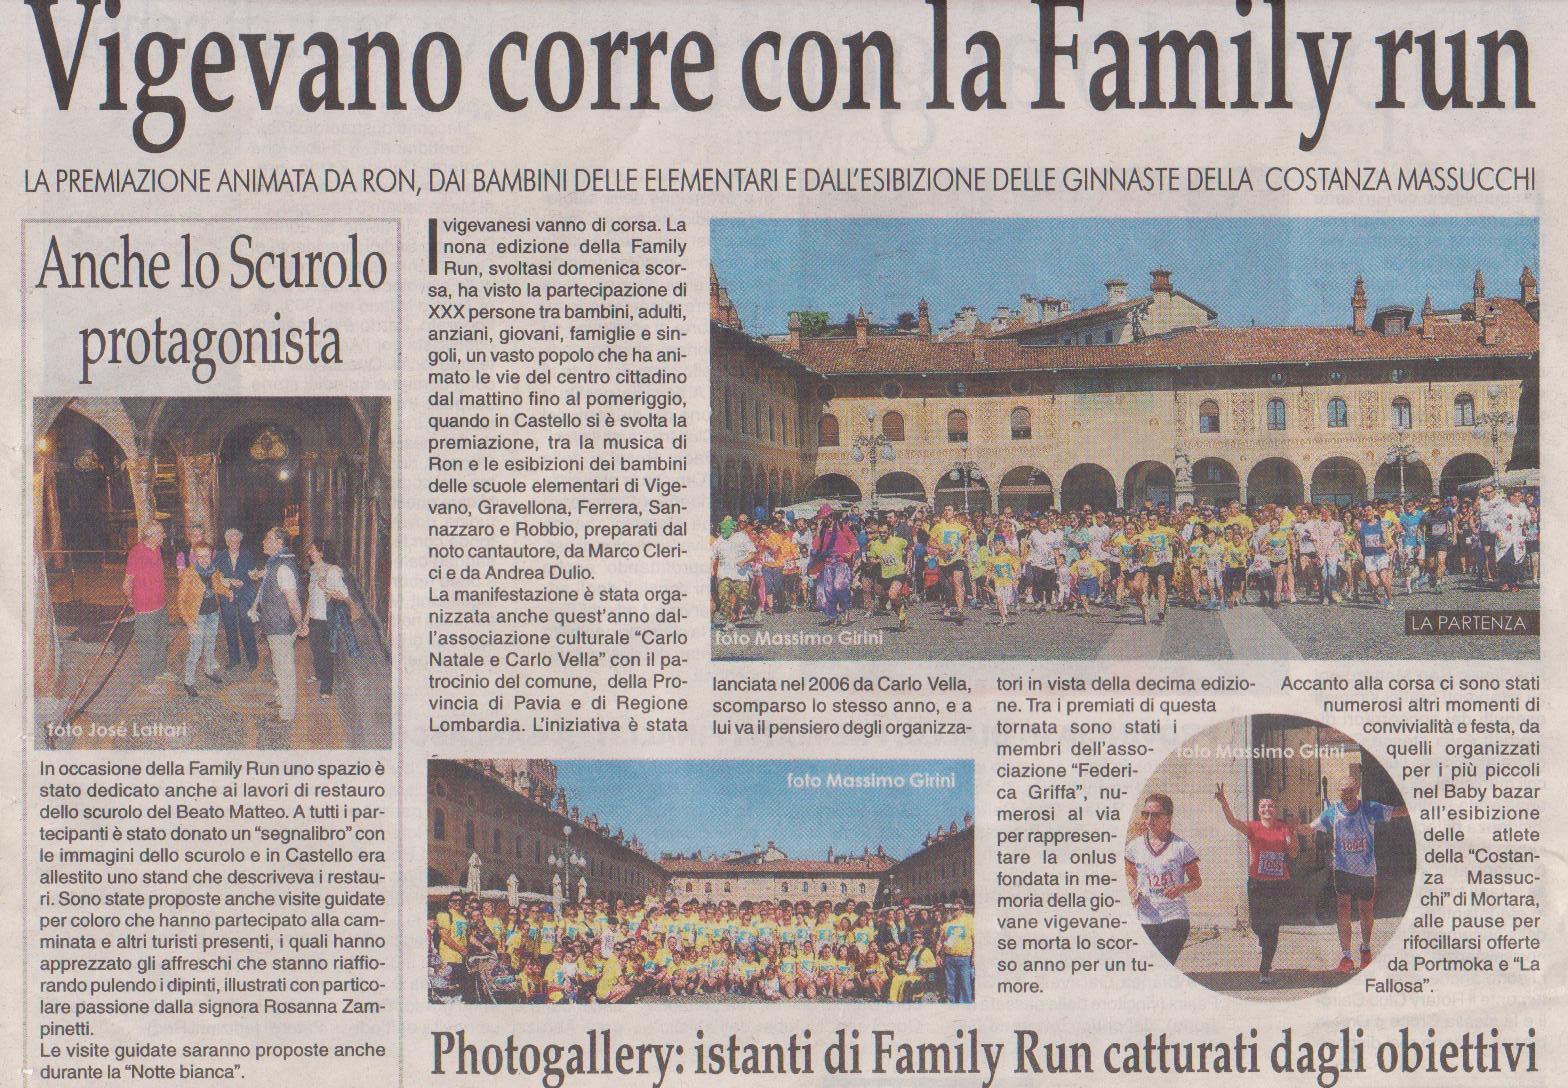 FAMILY RUN 2014